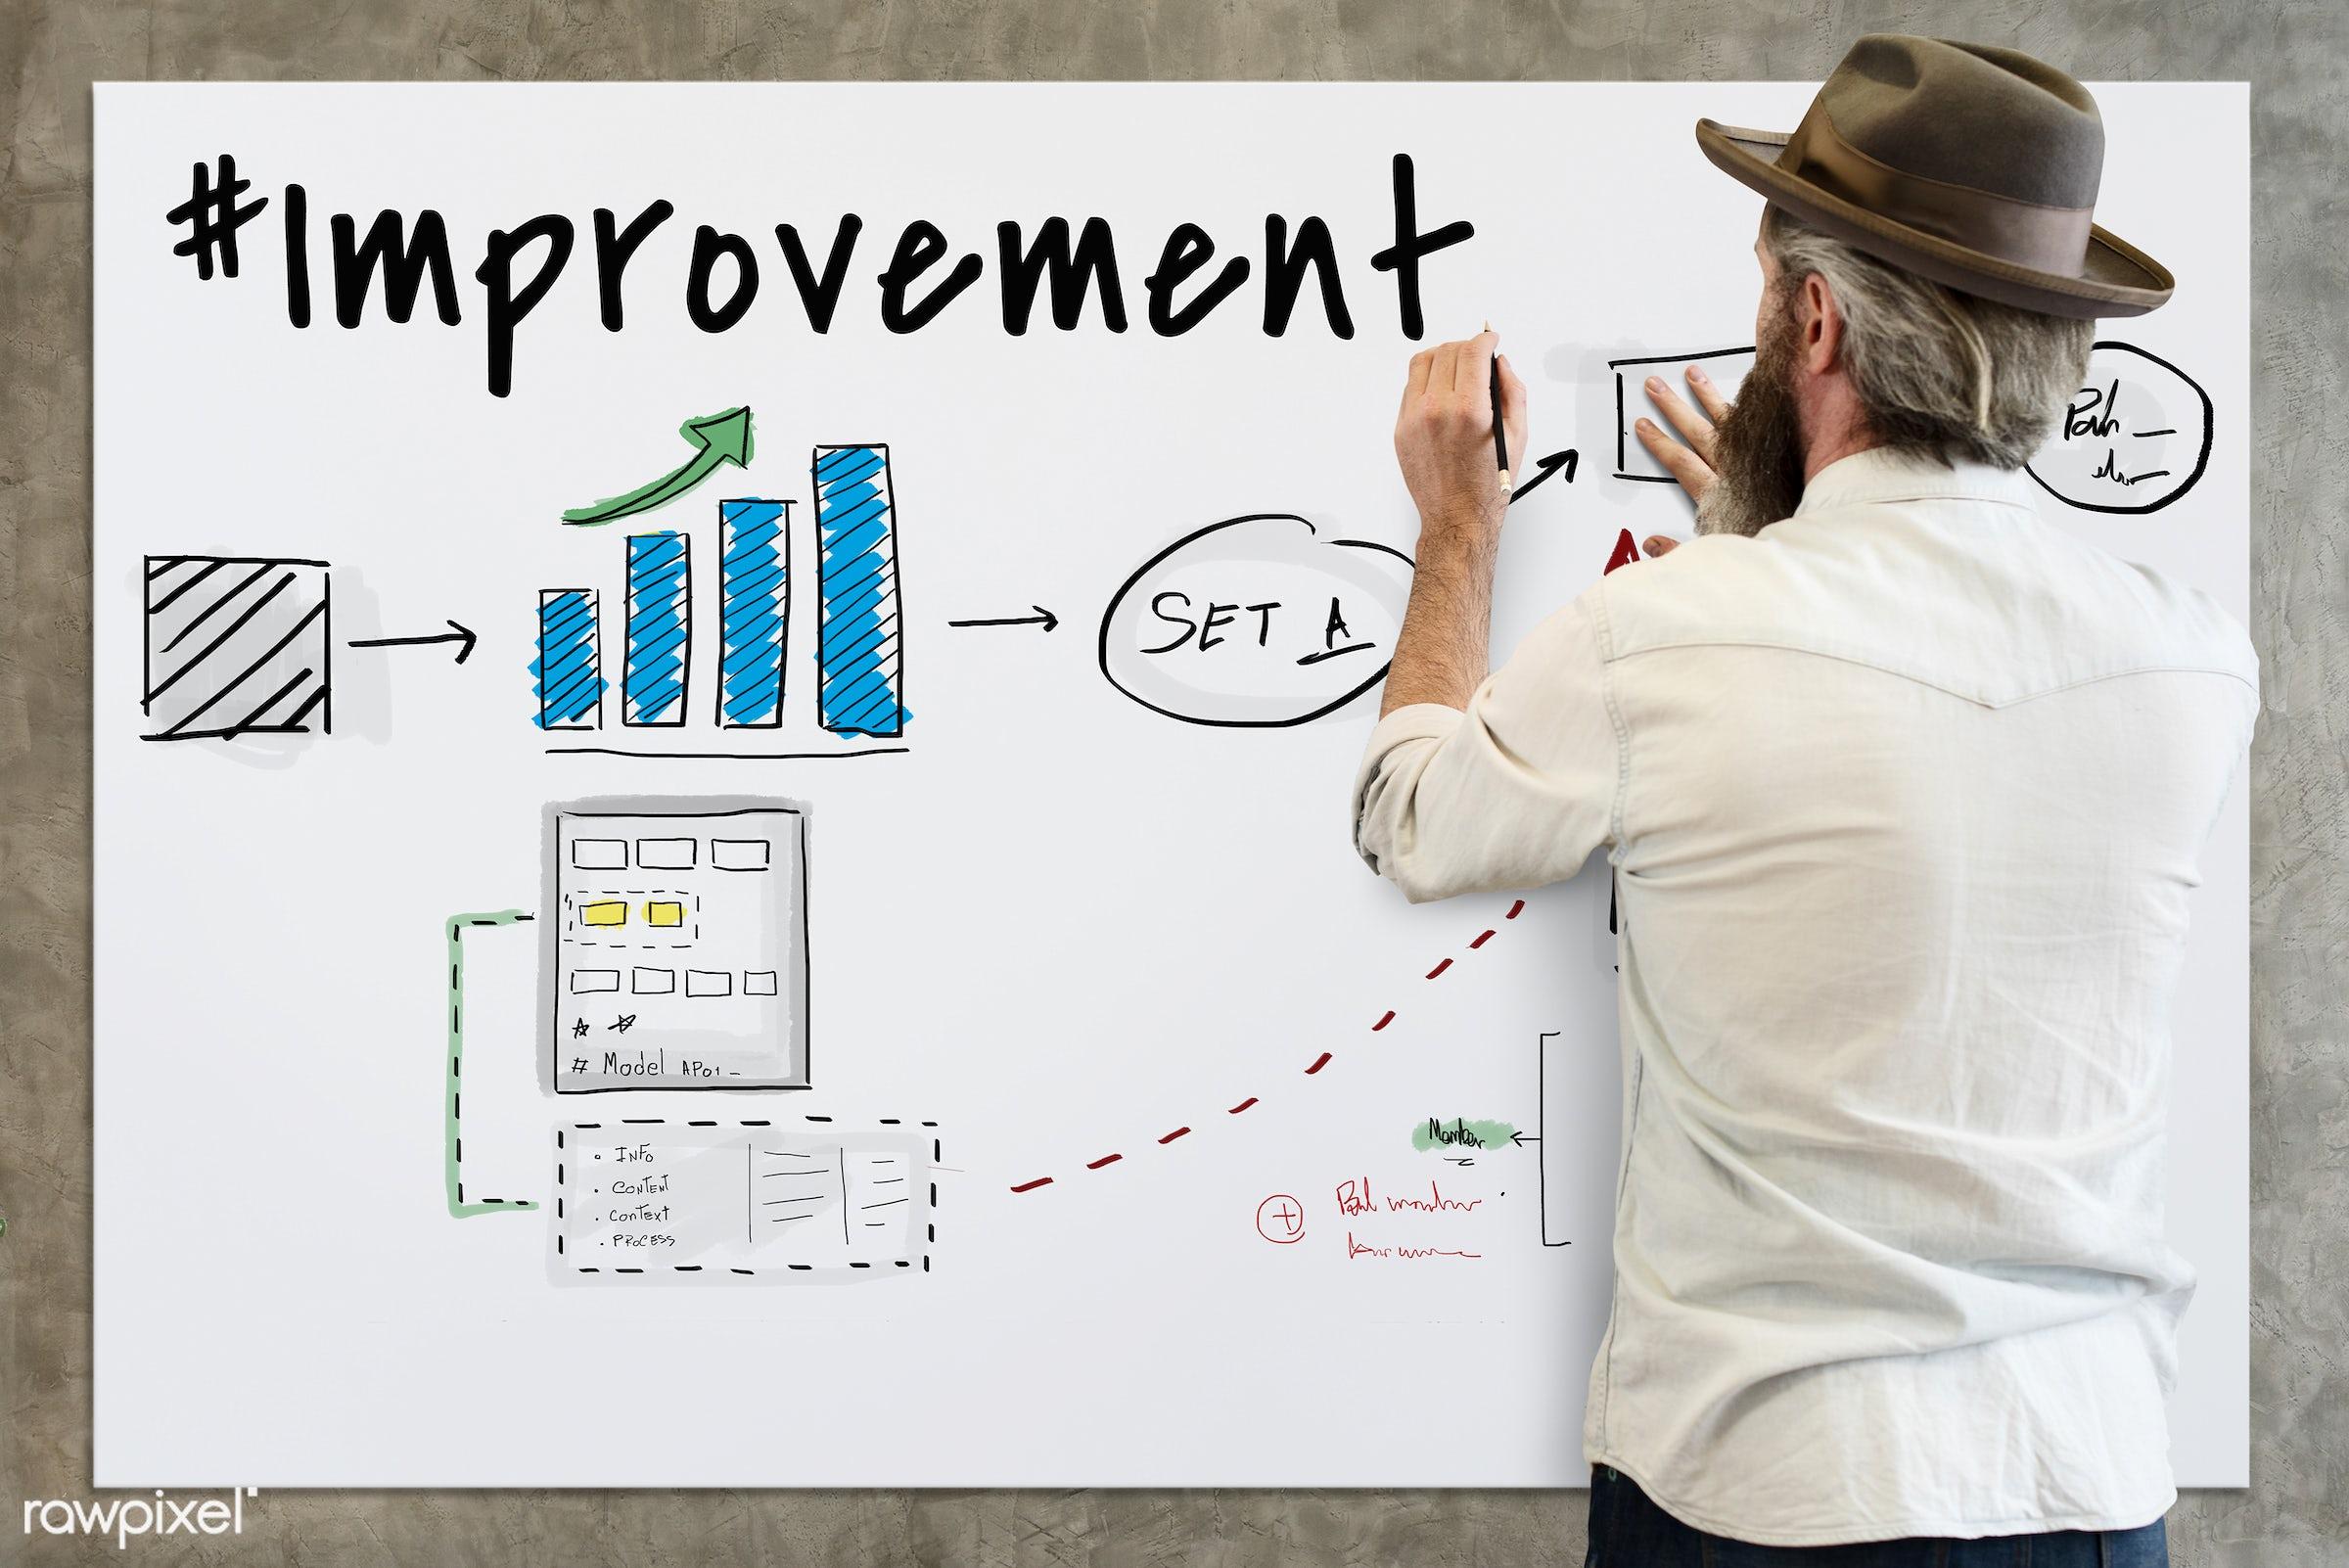 hat, adult, alone, analysis, back, be creative, beard, beard guy, board, business, carefree, casual, chart, chill, company,...